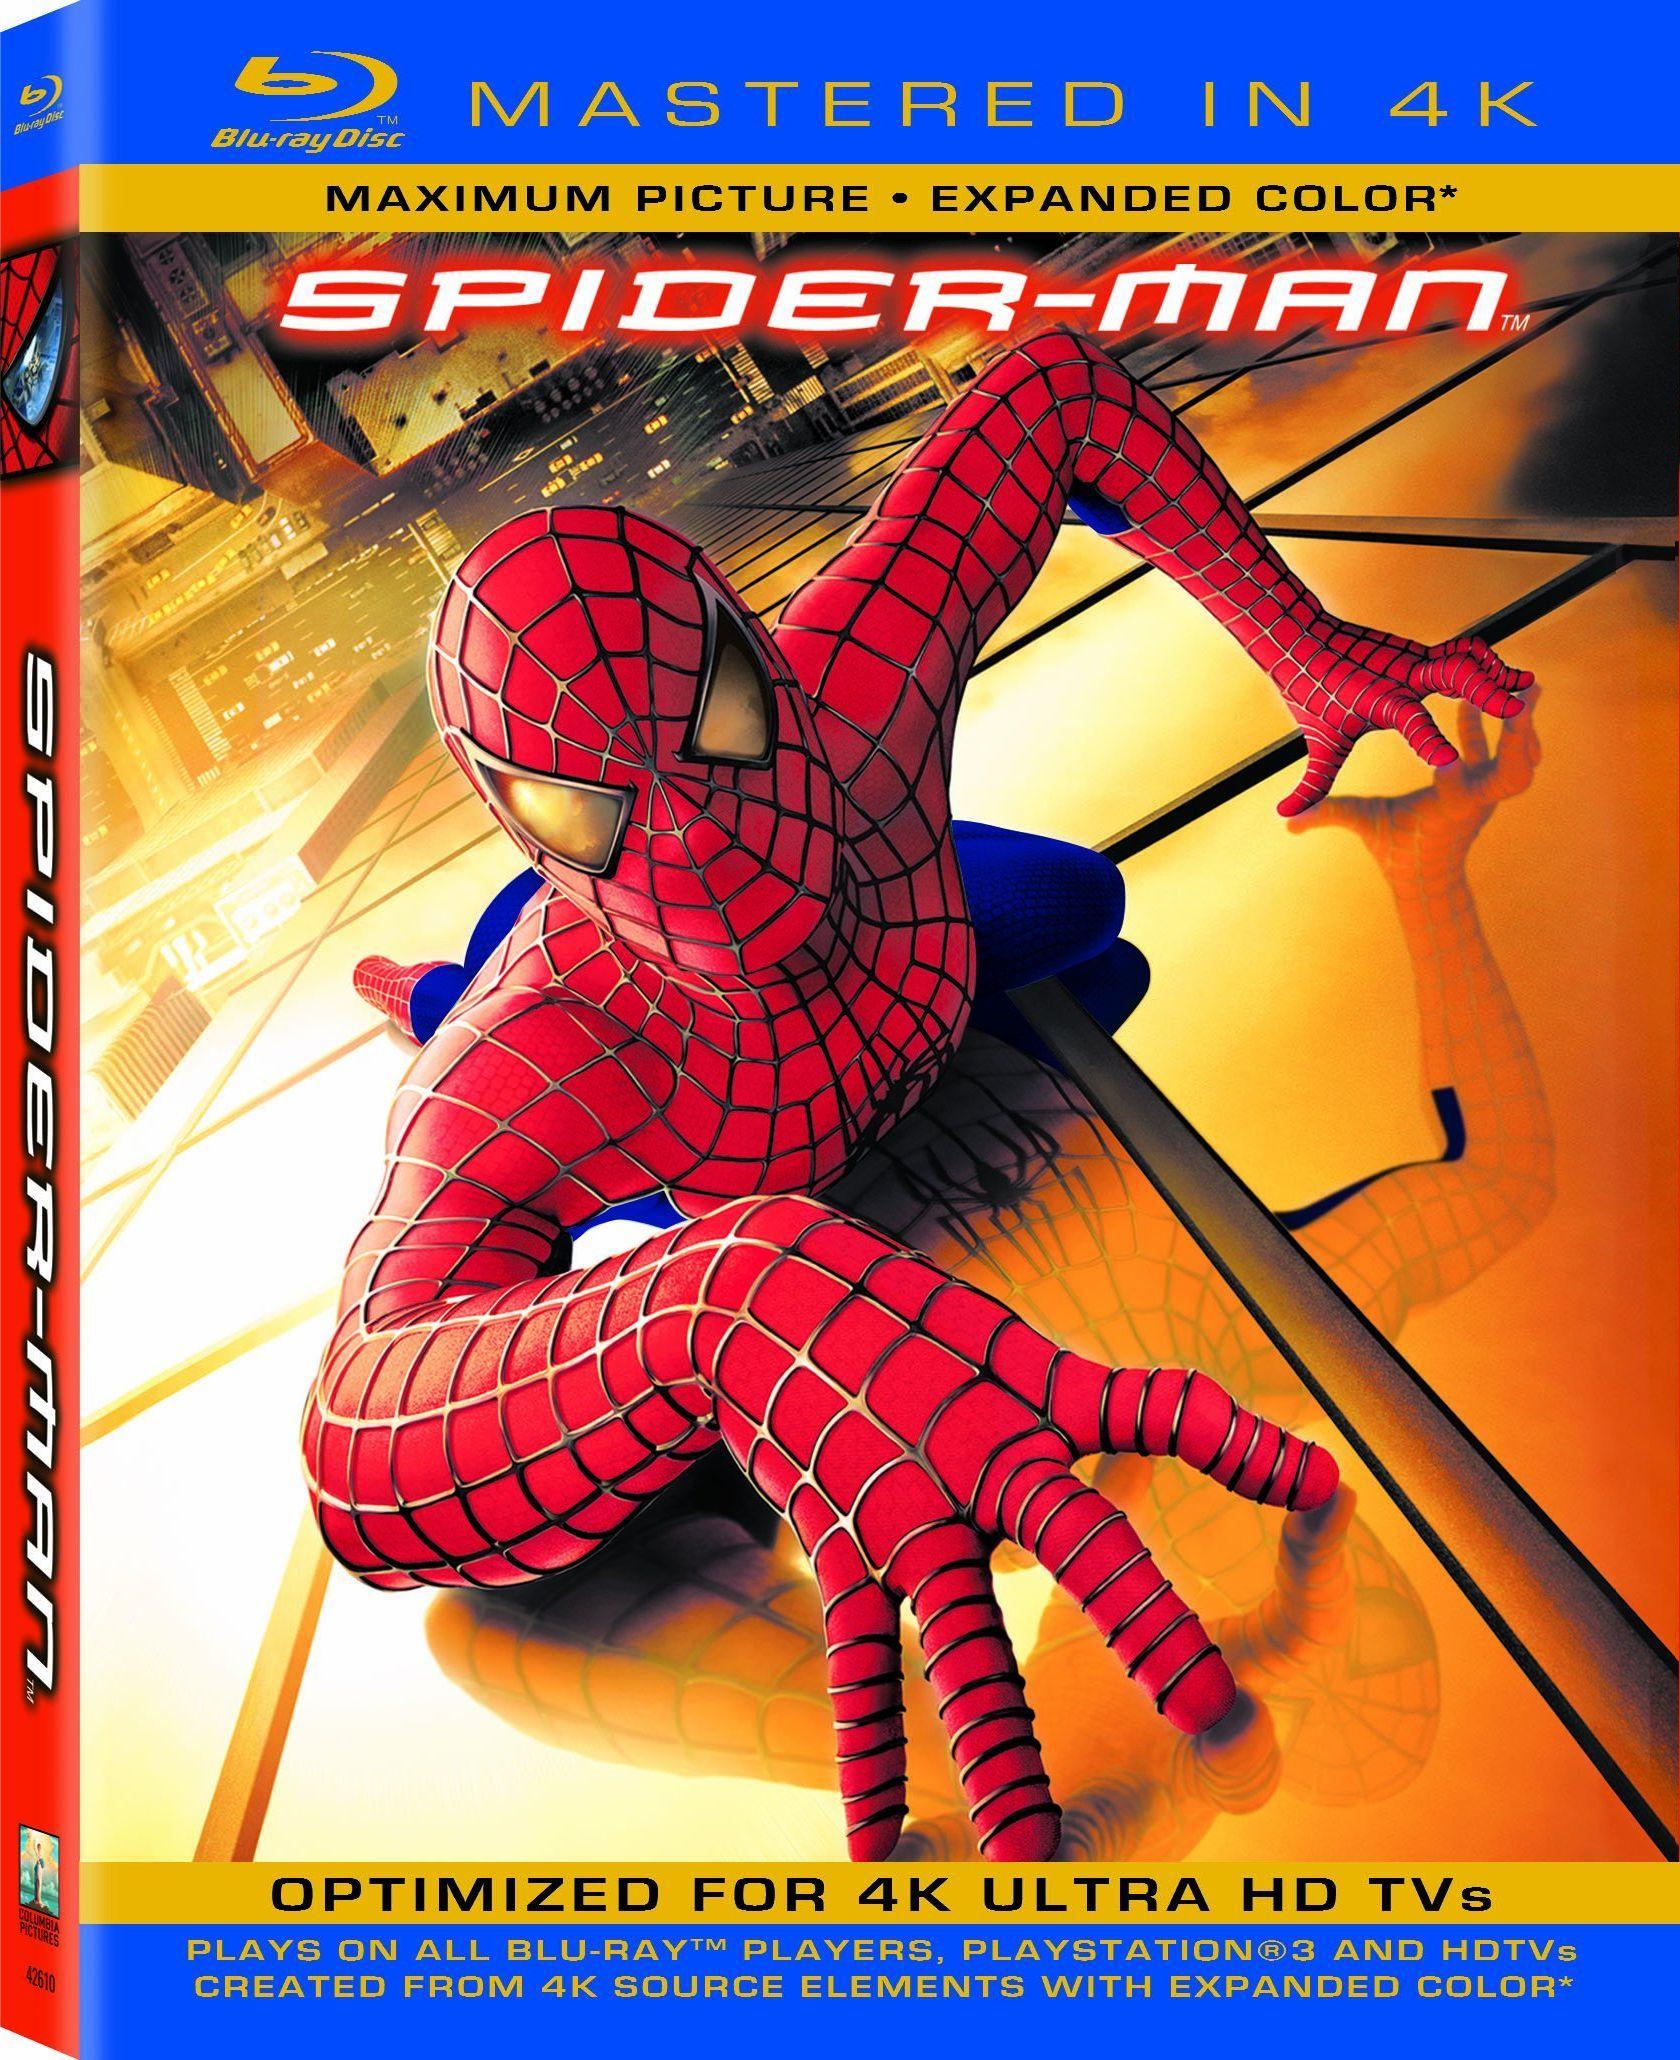 Spider-Man (2002) poster image